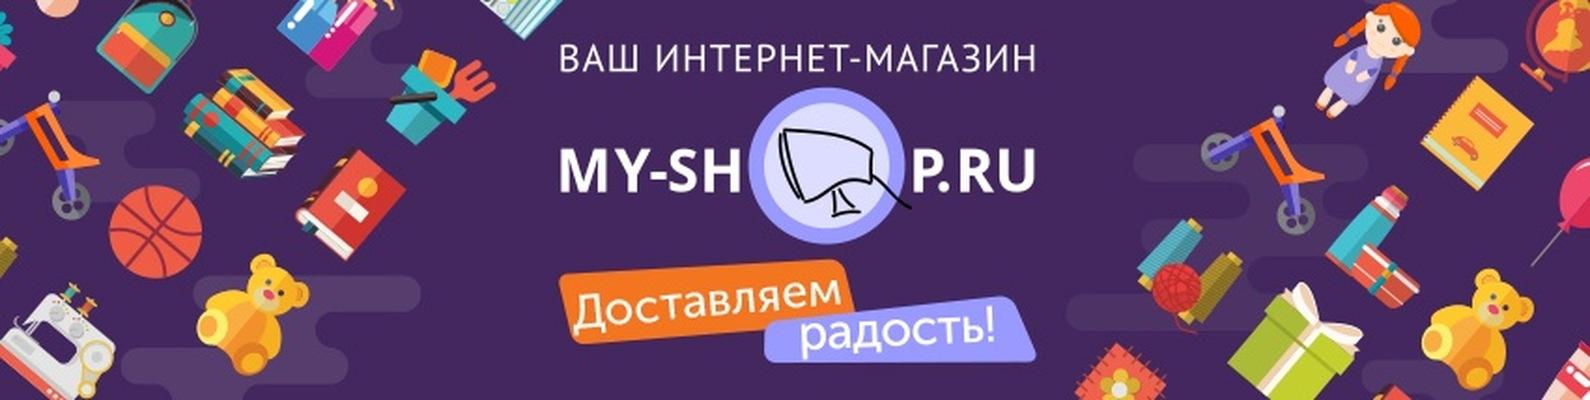 80d4019cbe8 Интернет-магазин My-shop.ru